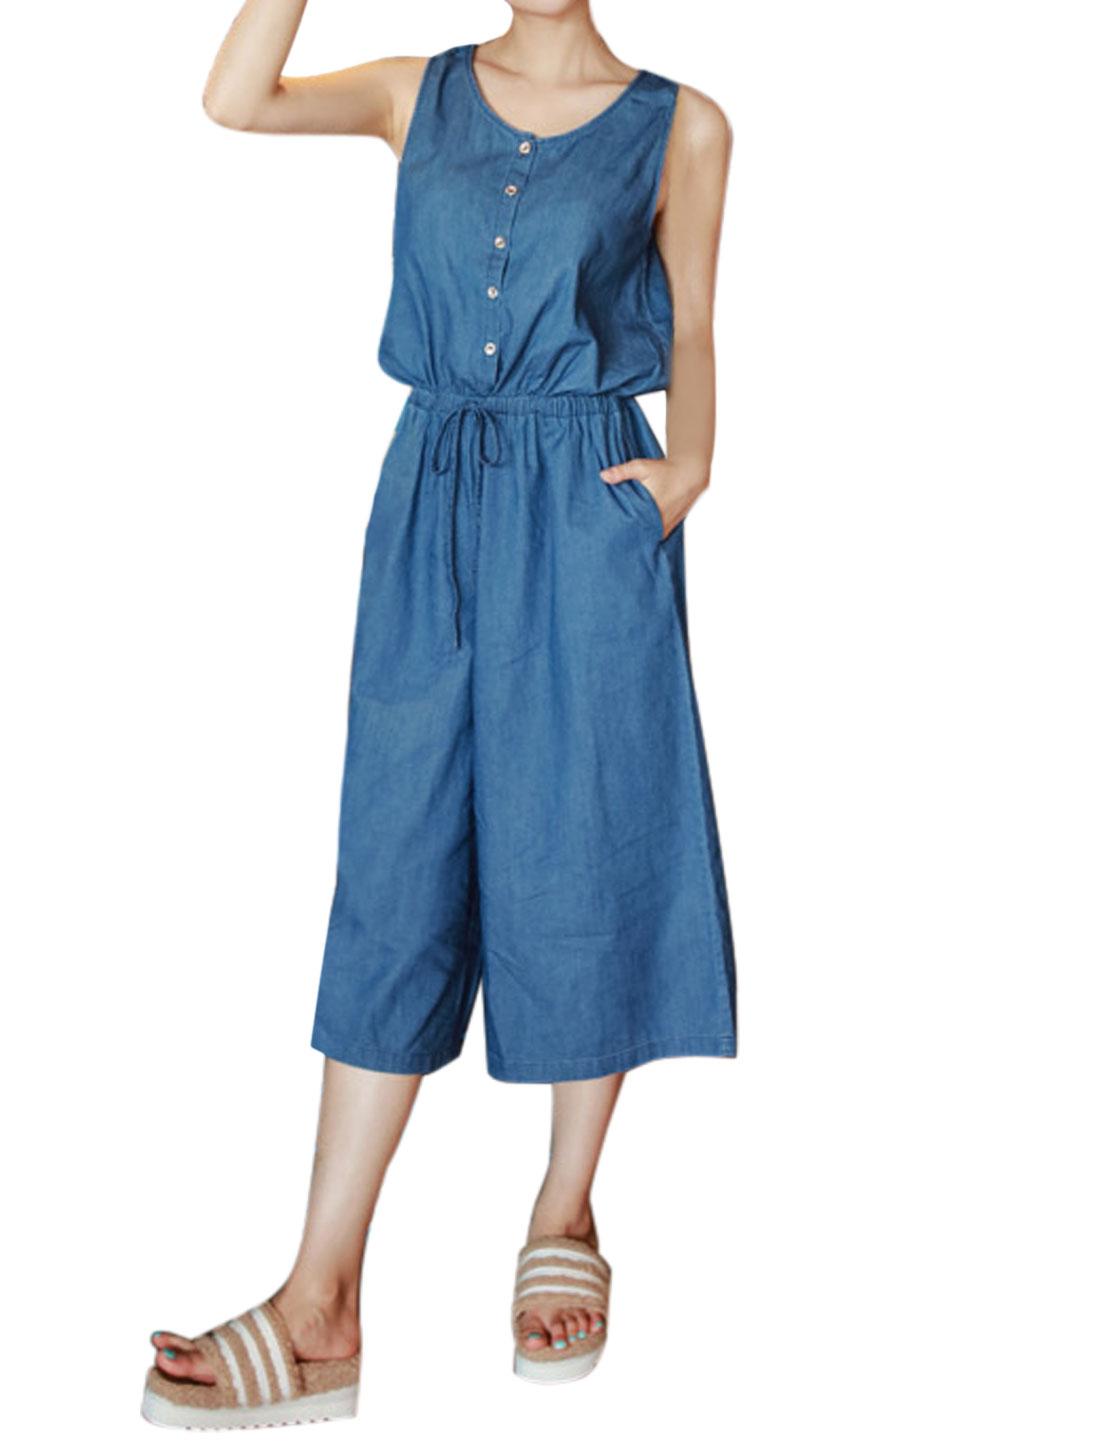 Women Sleeveless Half Button Closure Denim Culottes Jumpsuit Blue S